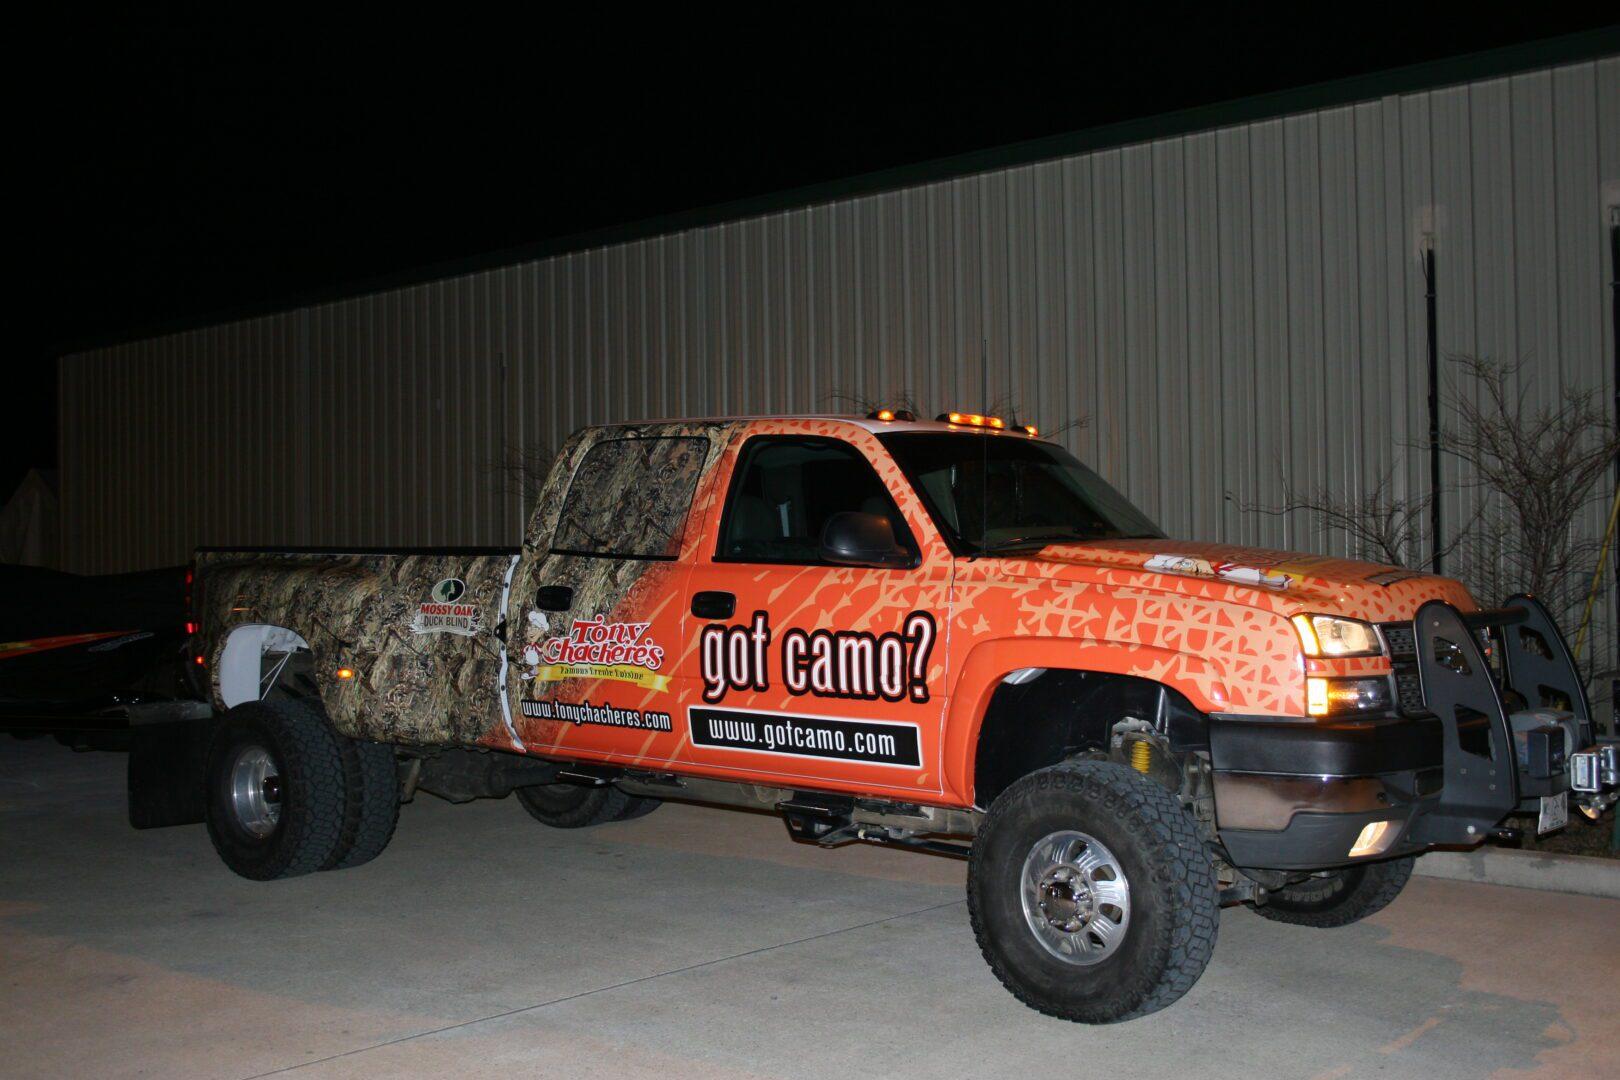 Fleet Graphics Slidell, LA Trailer Wraps SEI HQ Got Camo Truck